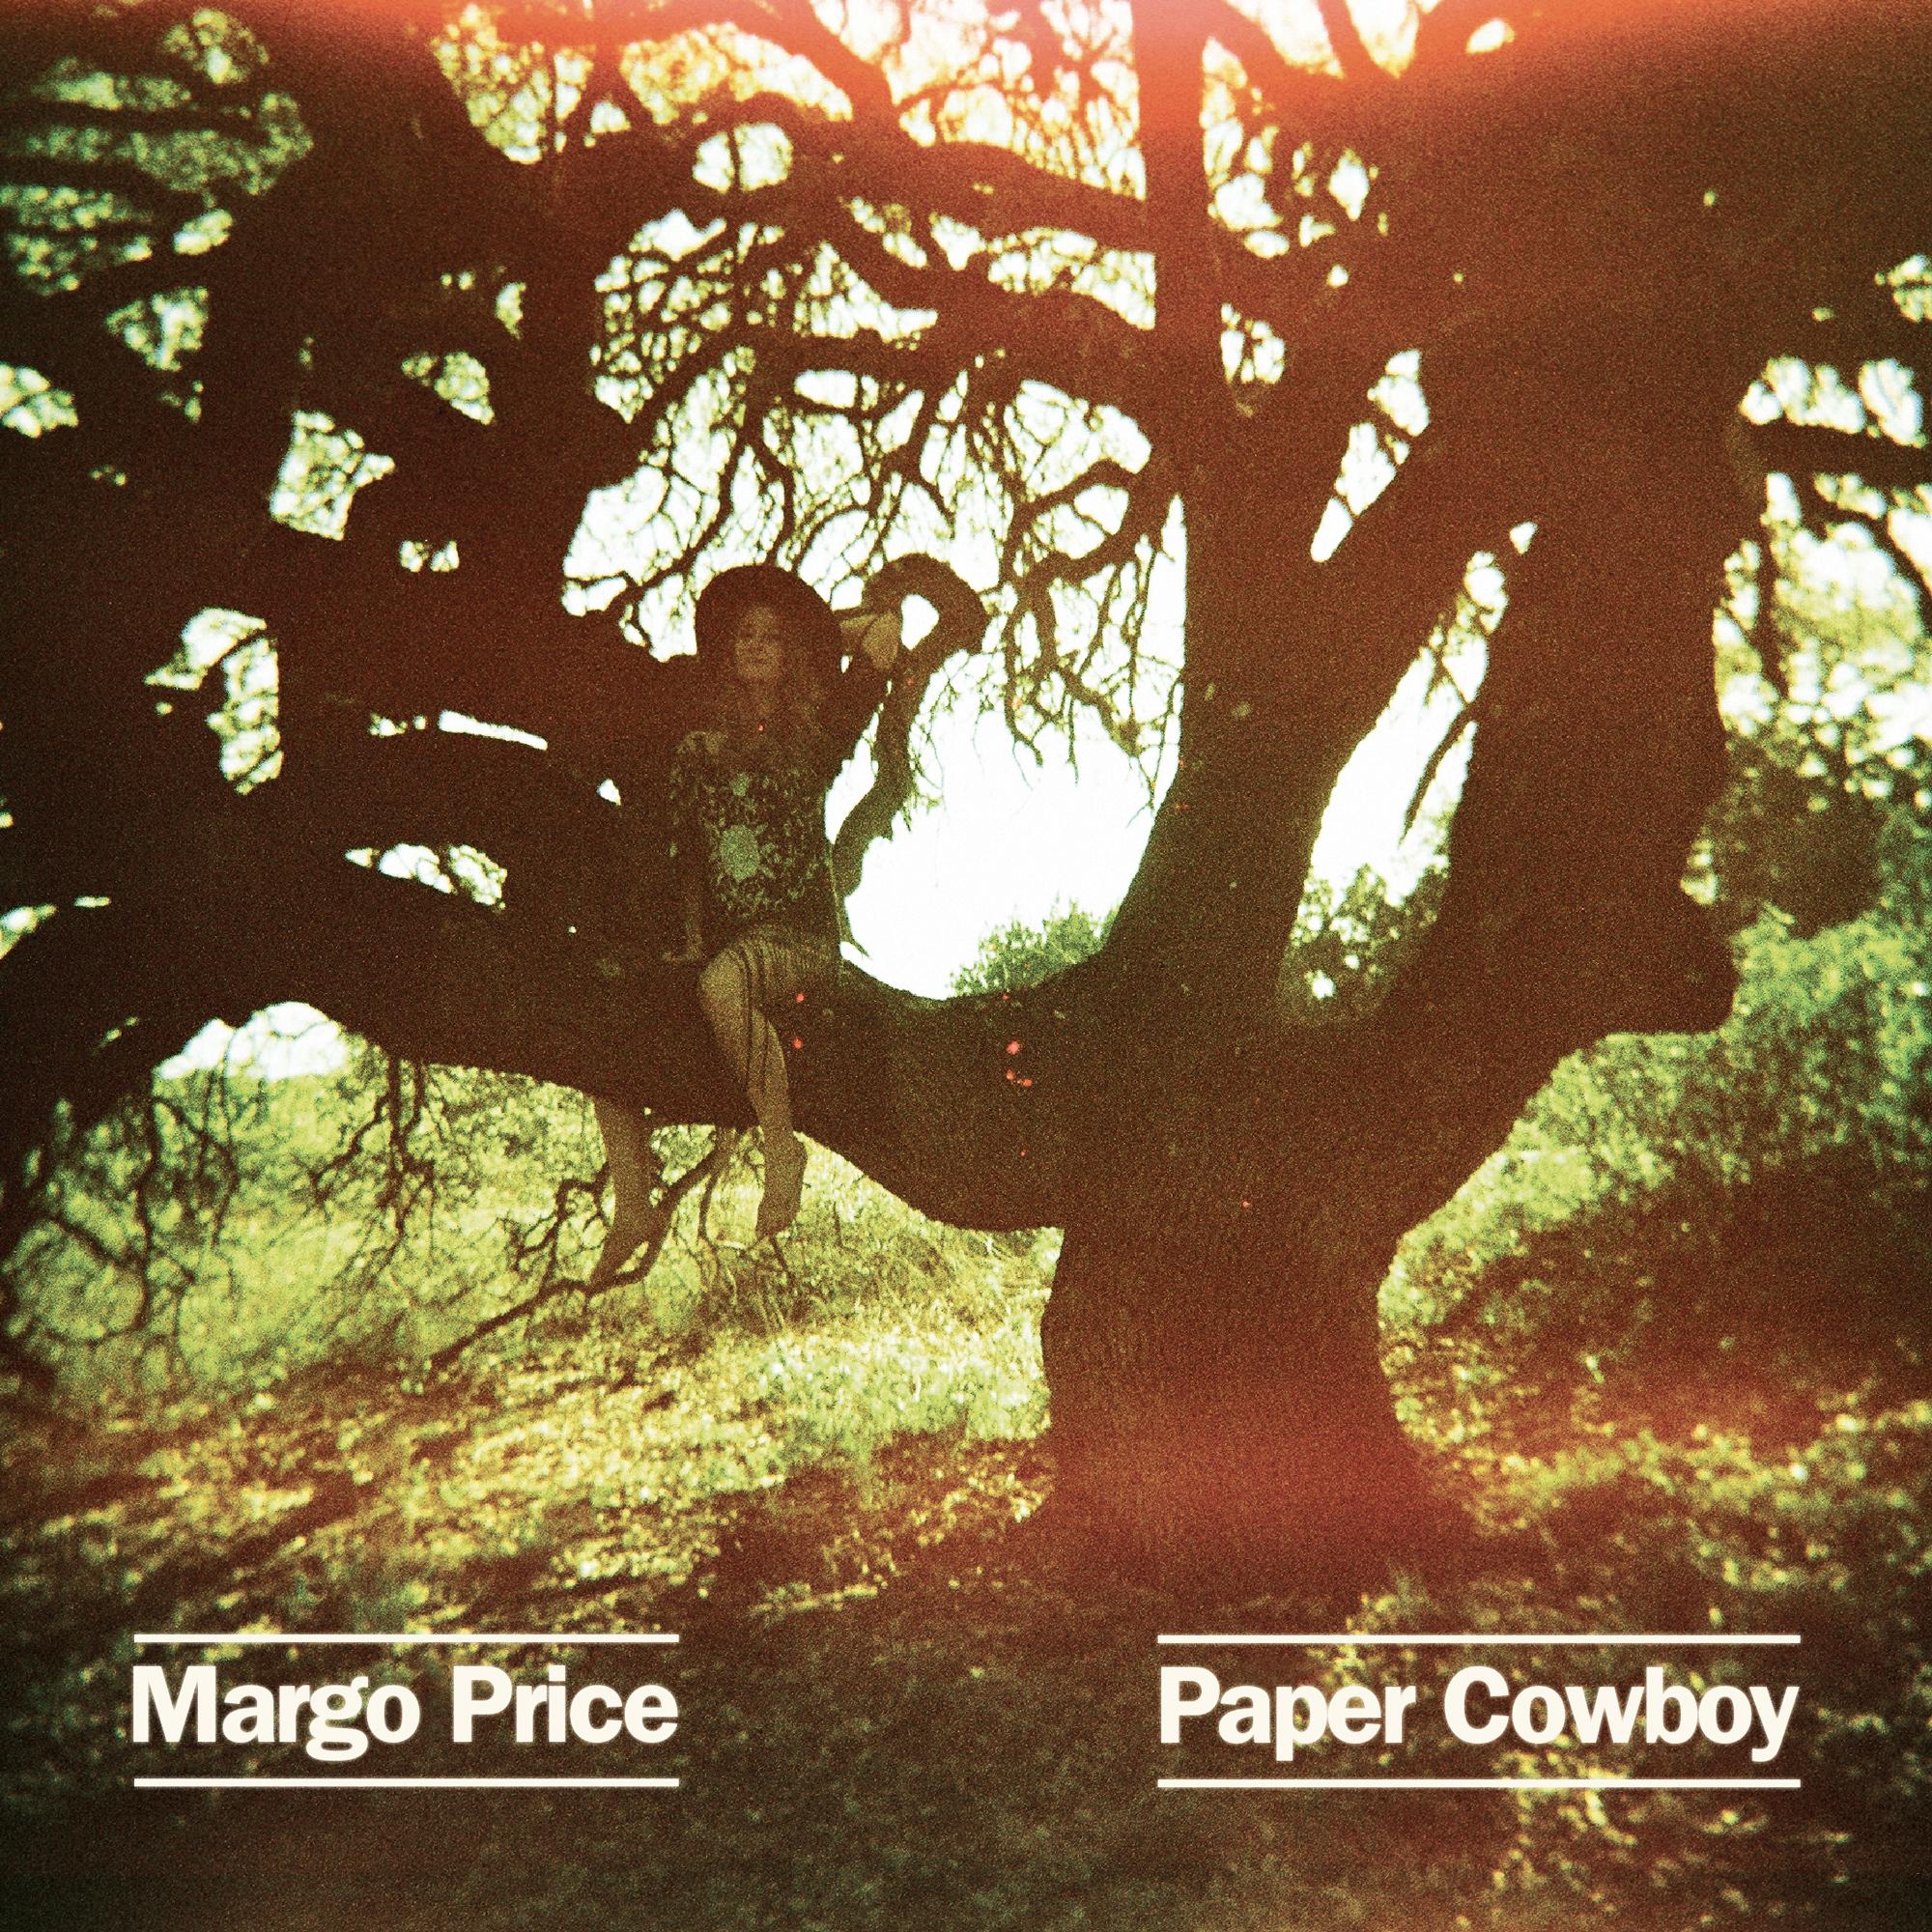 Margo Price's Paper Cowboy EP